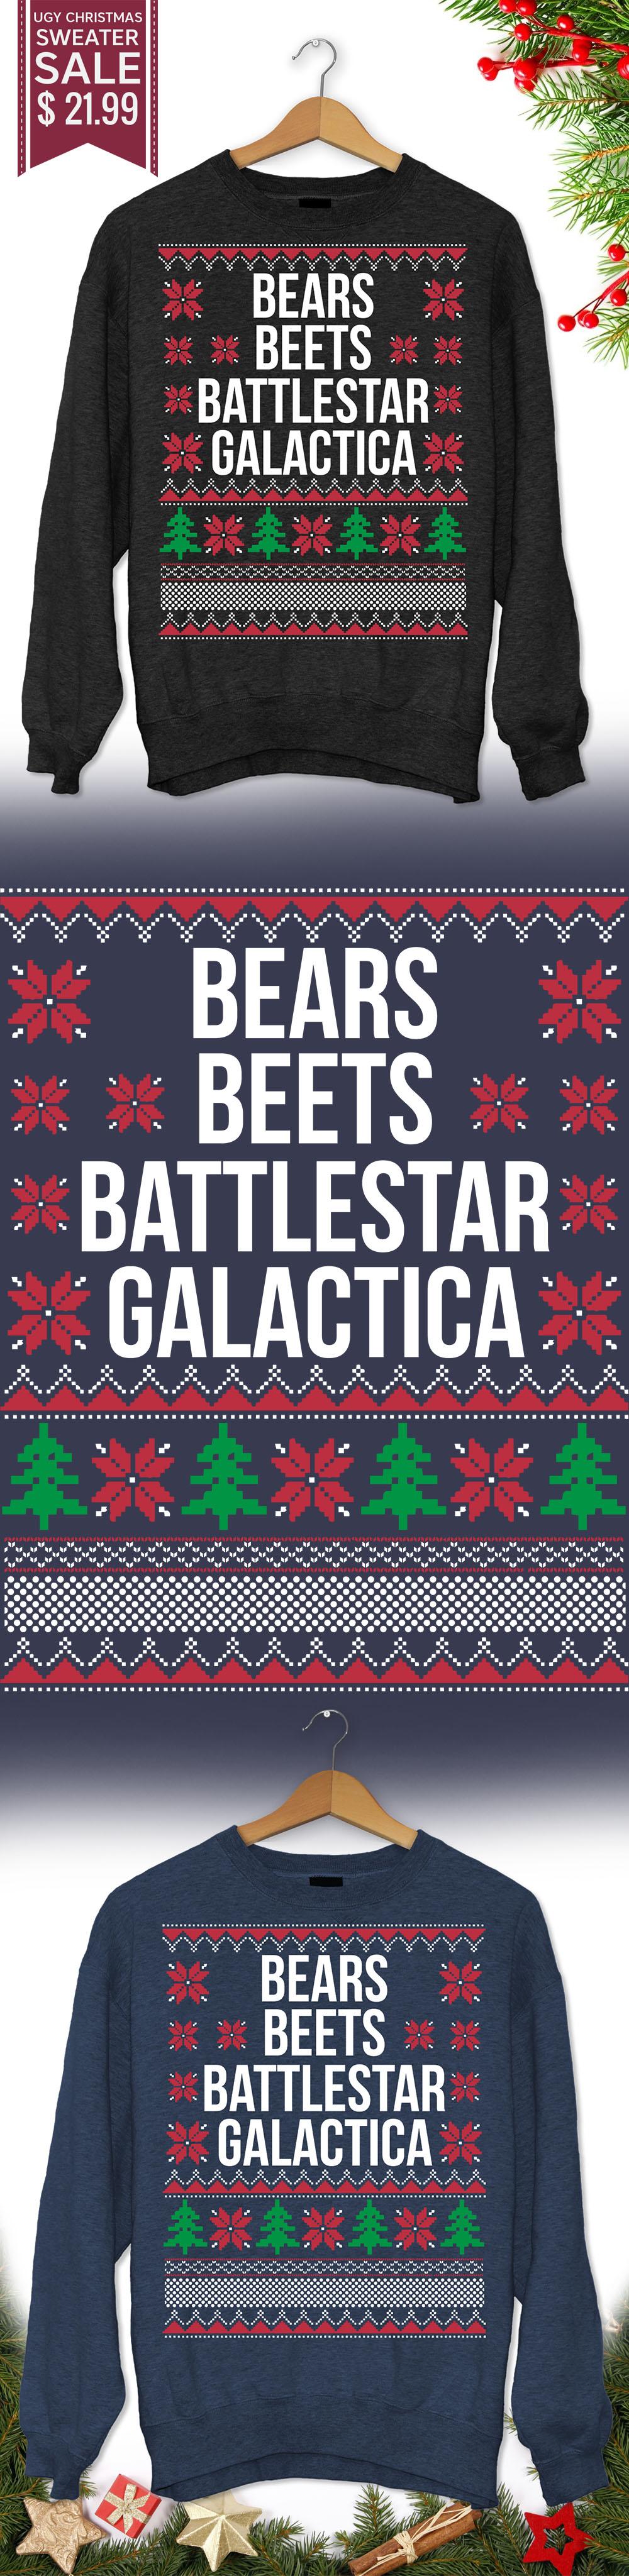 Bears Beets Battlestar Galactica Humorous Christmas Sweaters